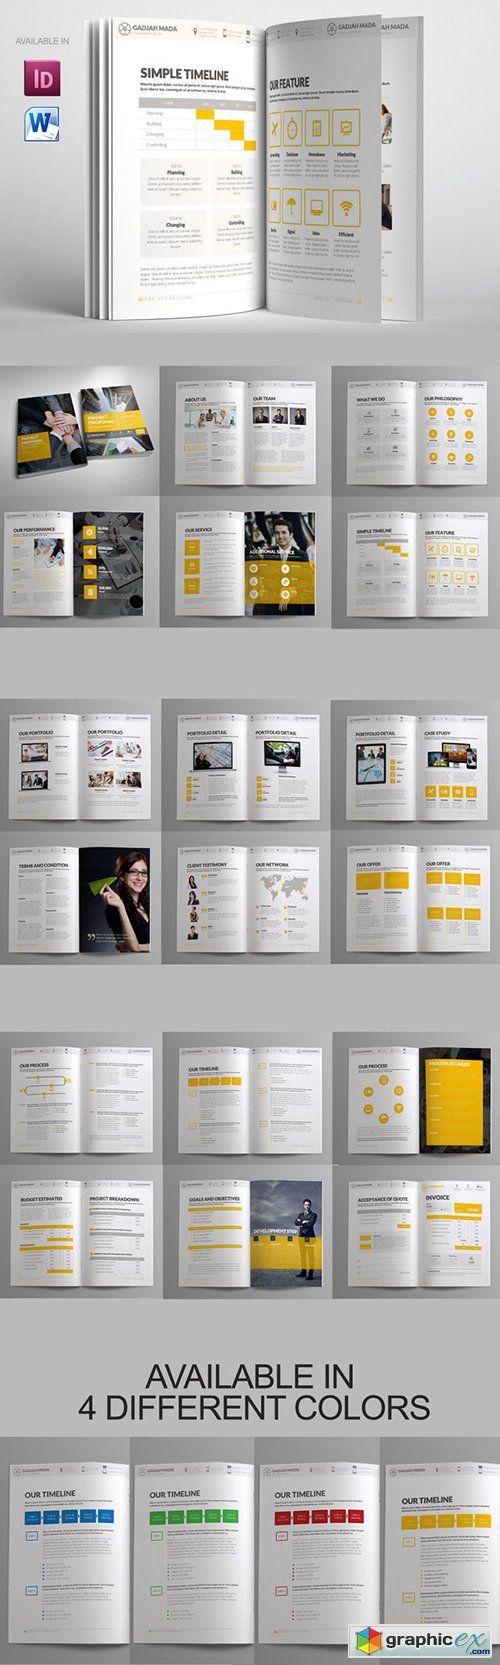 12 mejores imágenes de Empresa contratista en Pinterest | Empresas ...